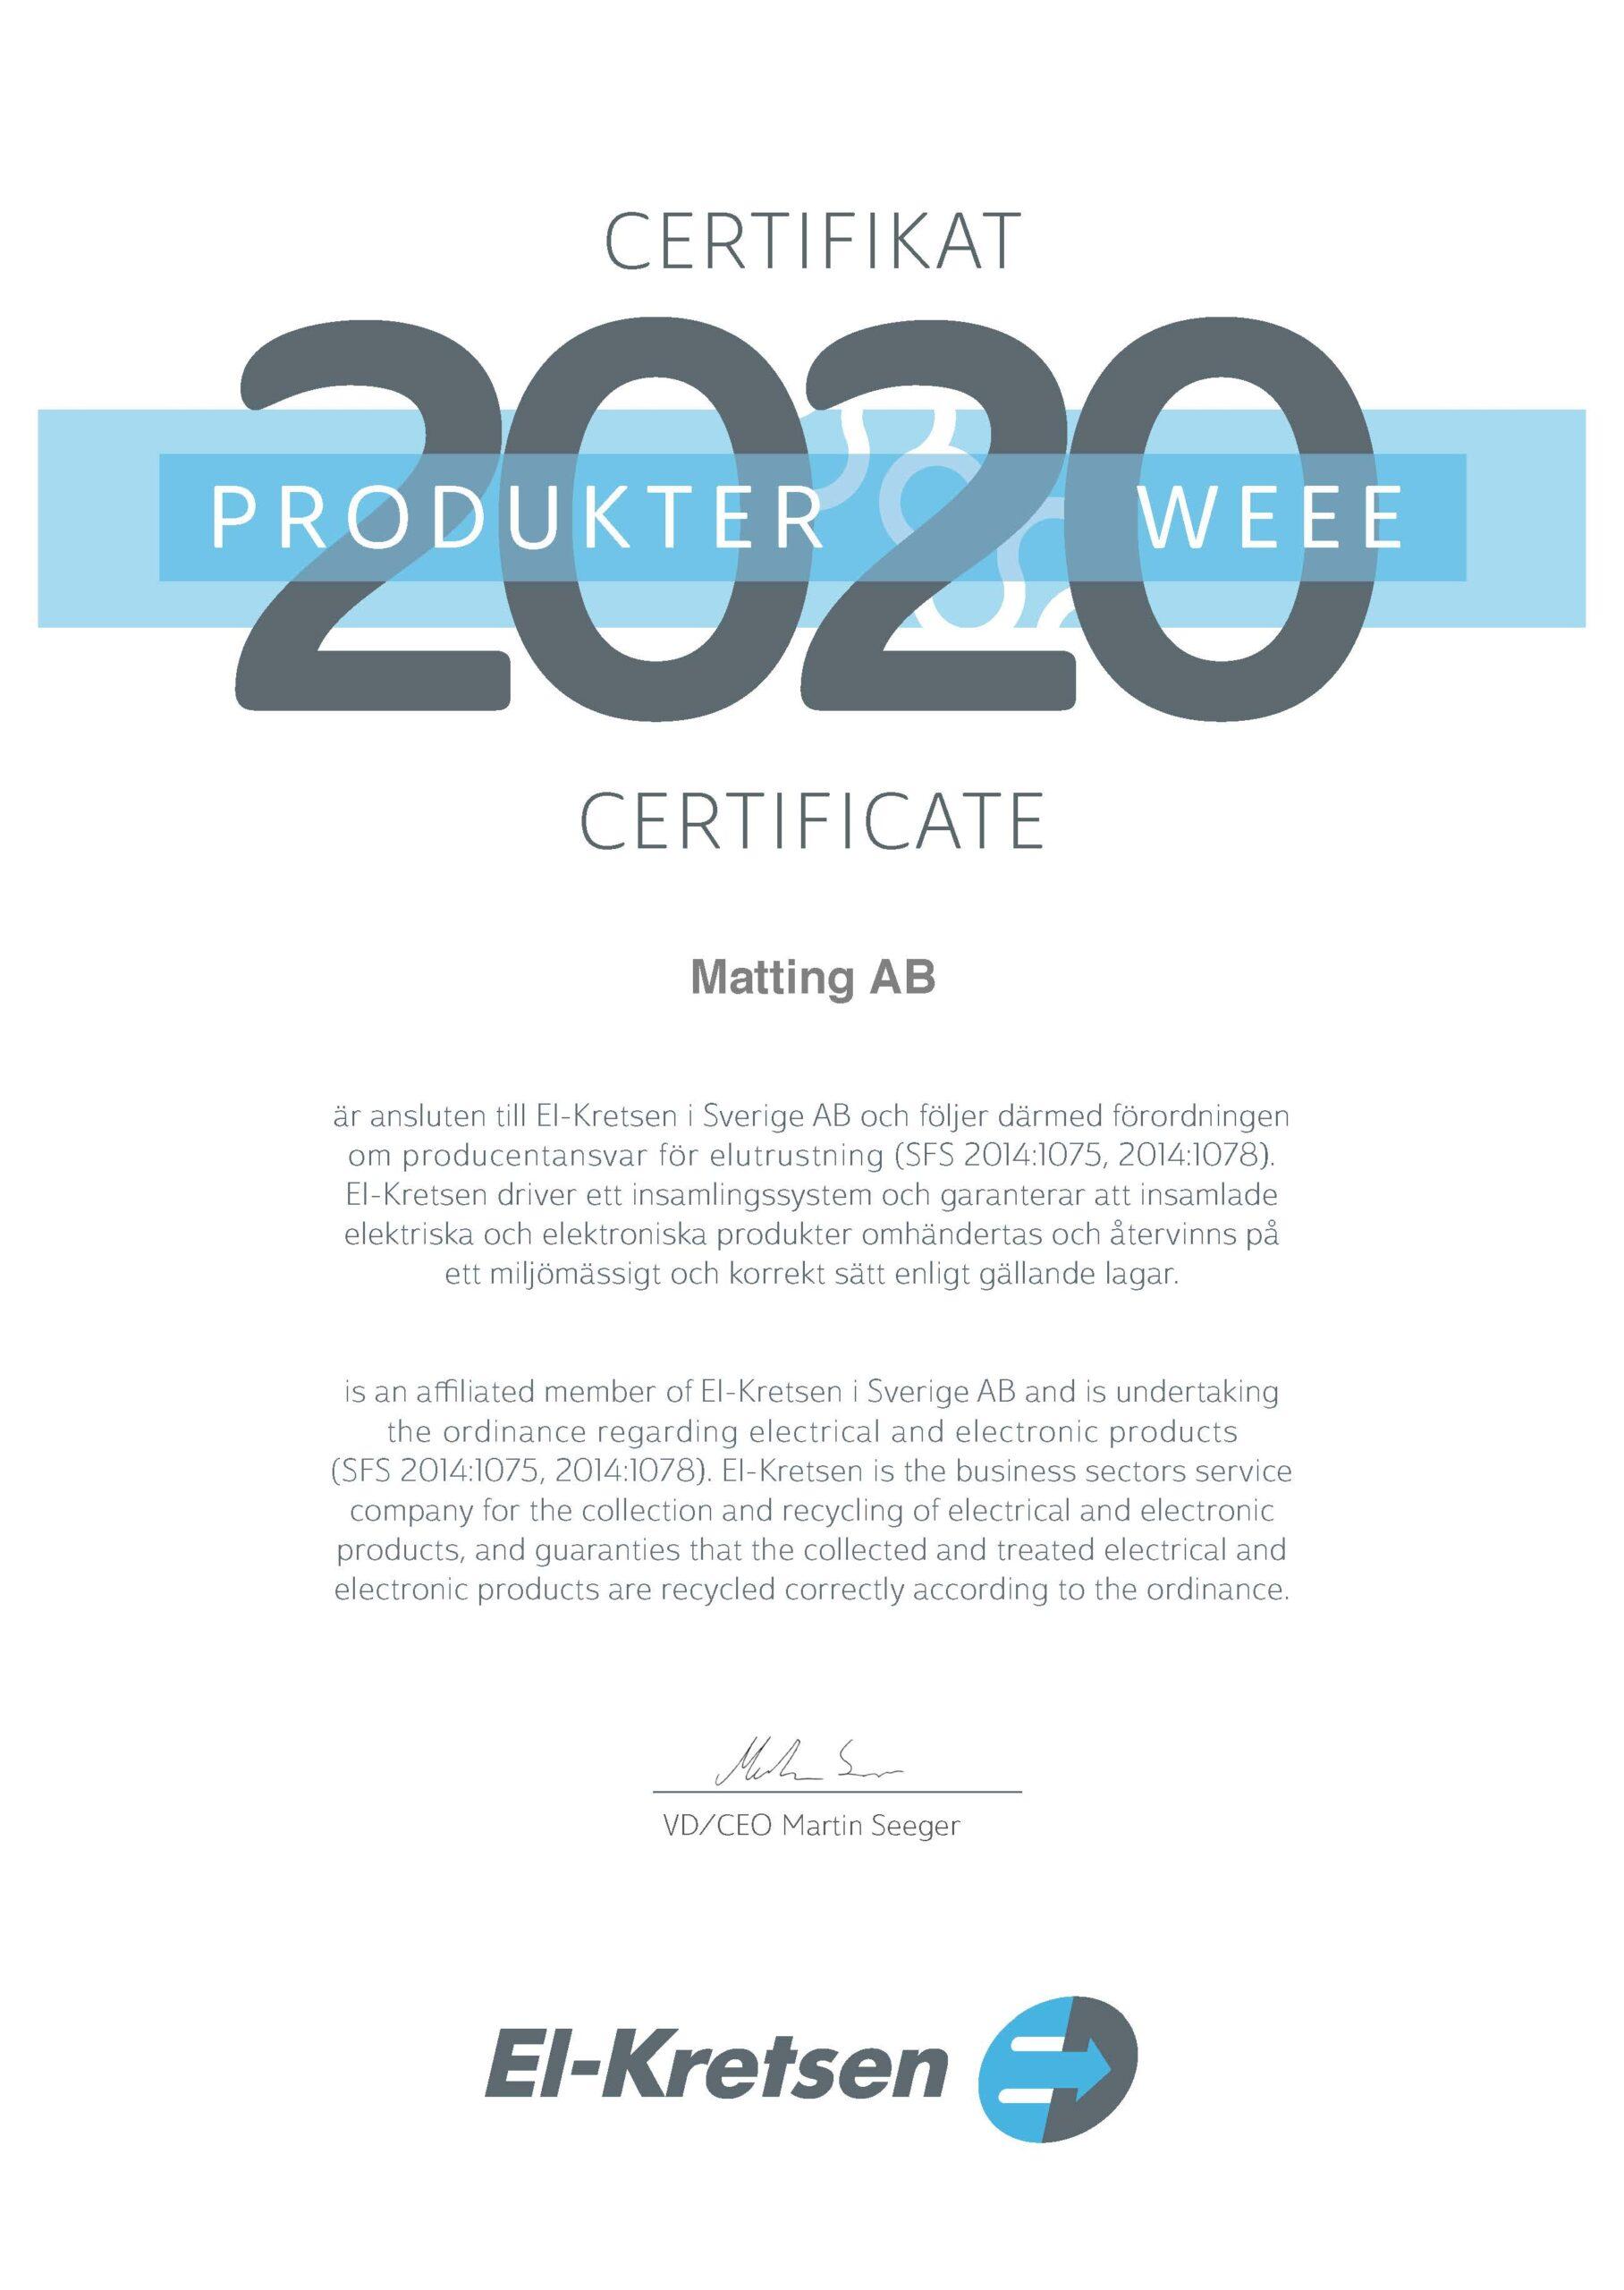 Certifikat produkter